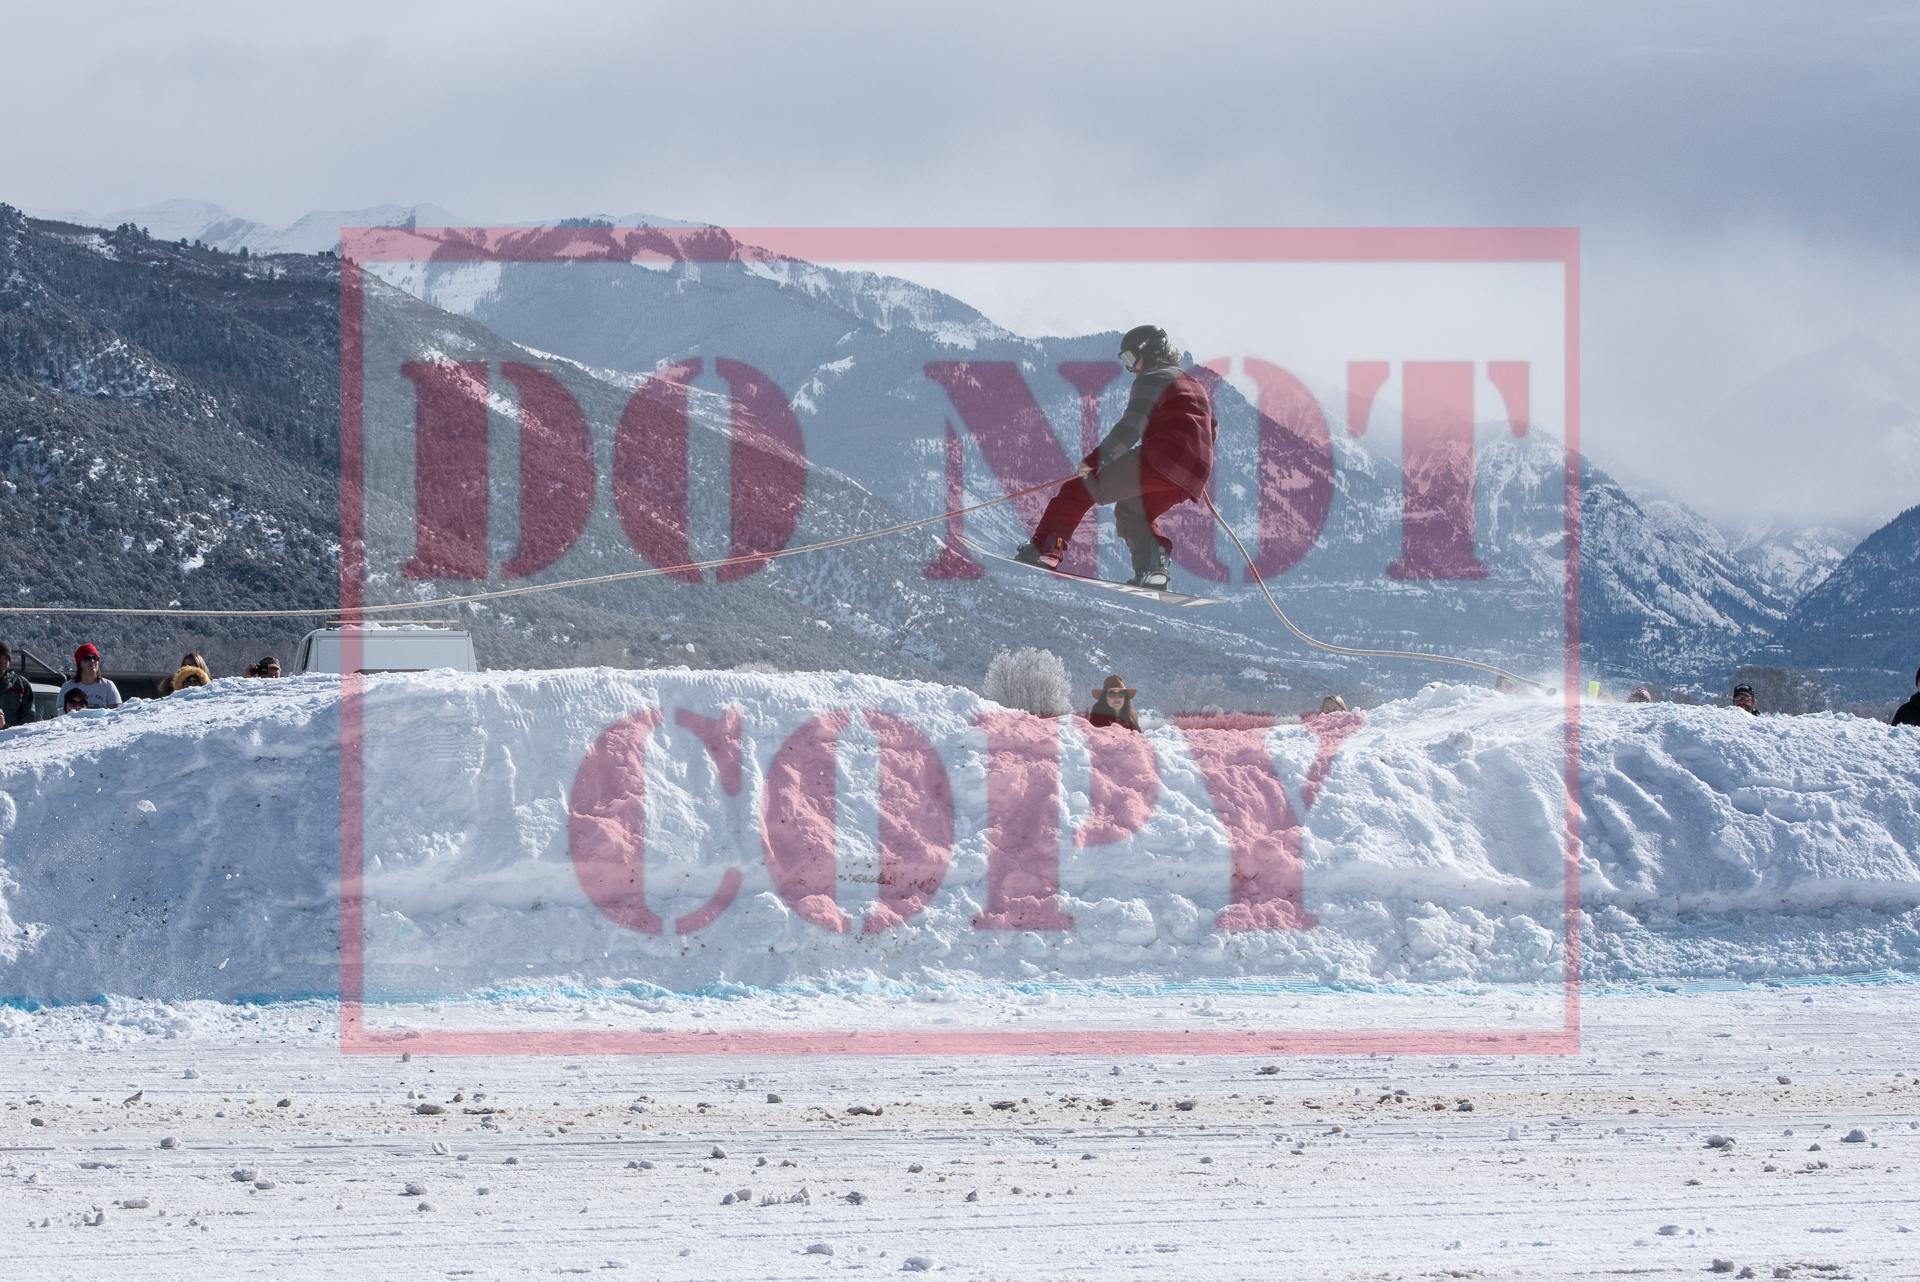 - Amanda Sanders - Snowboard 4